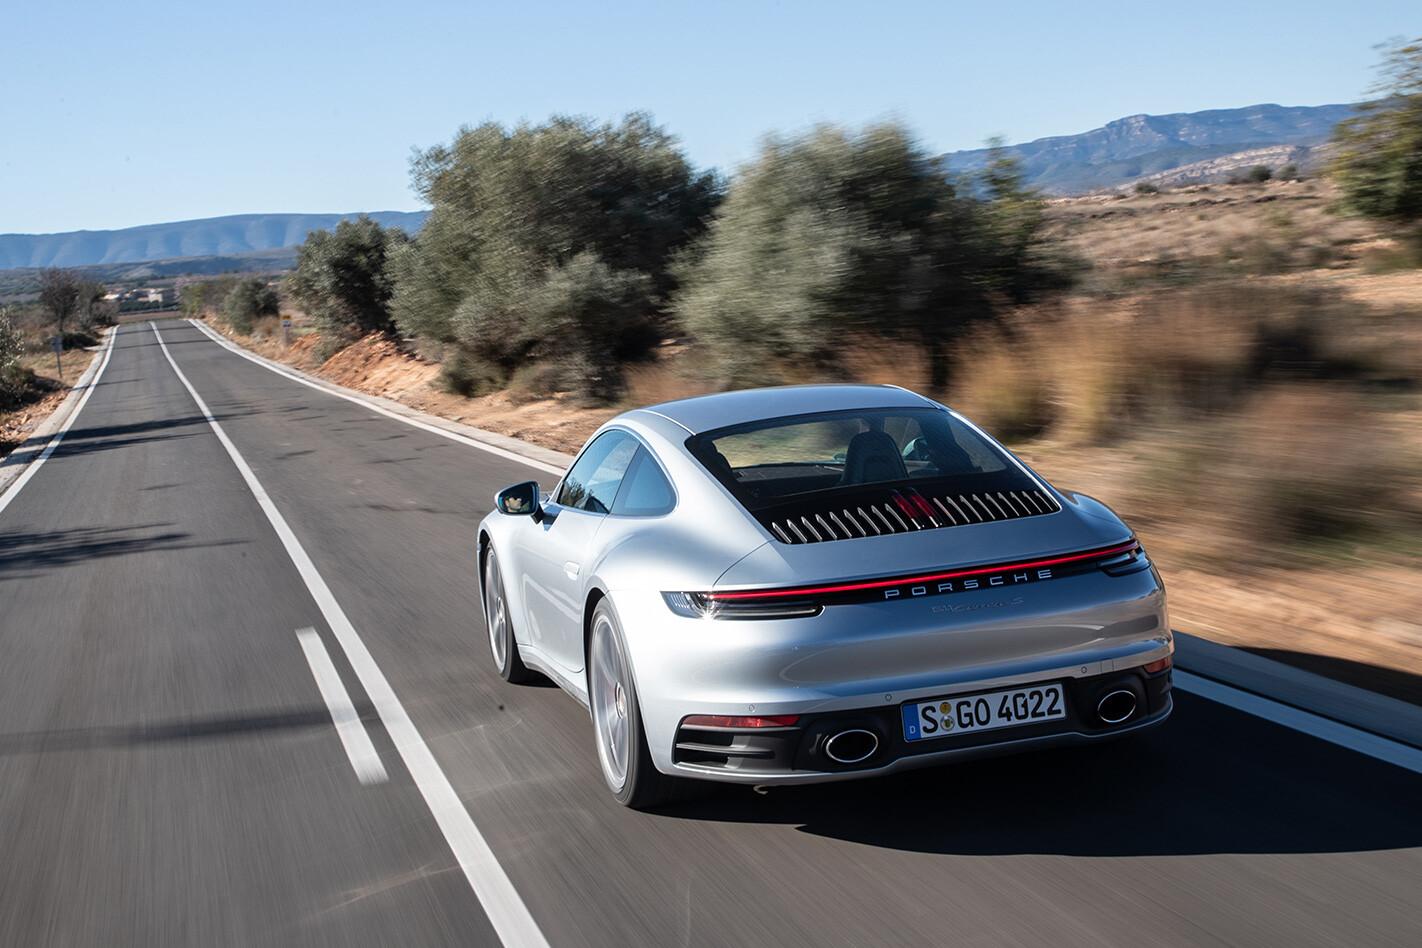 Porsche 911 Carrera S Rearss Jpg